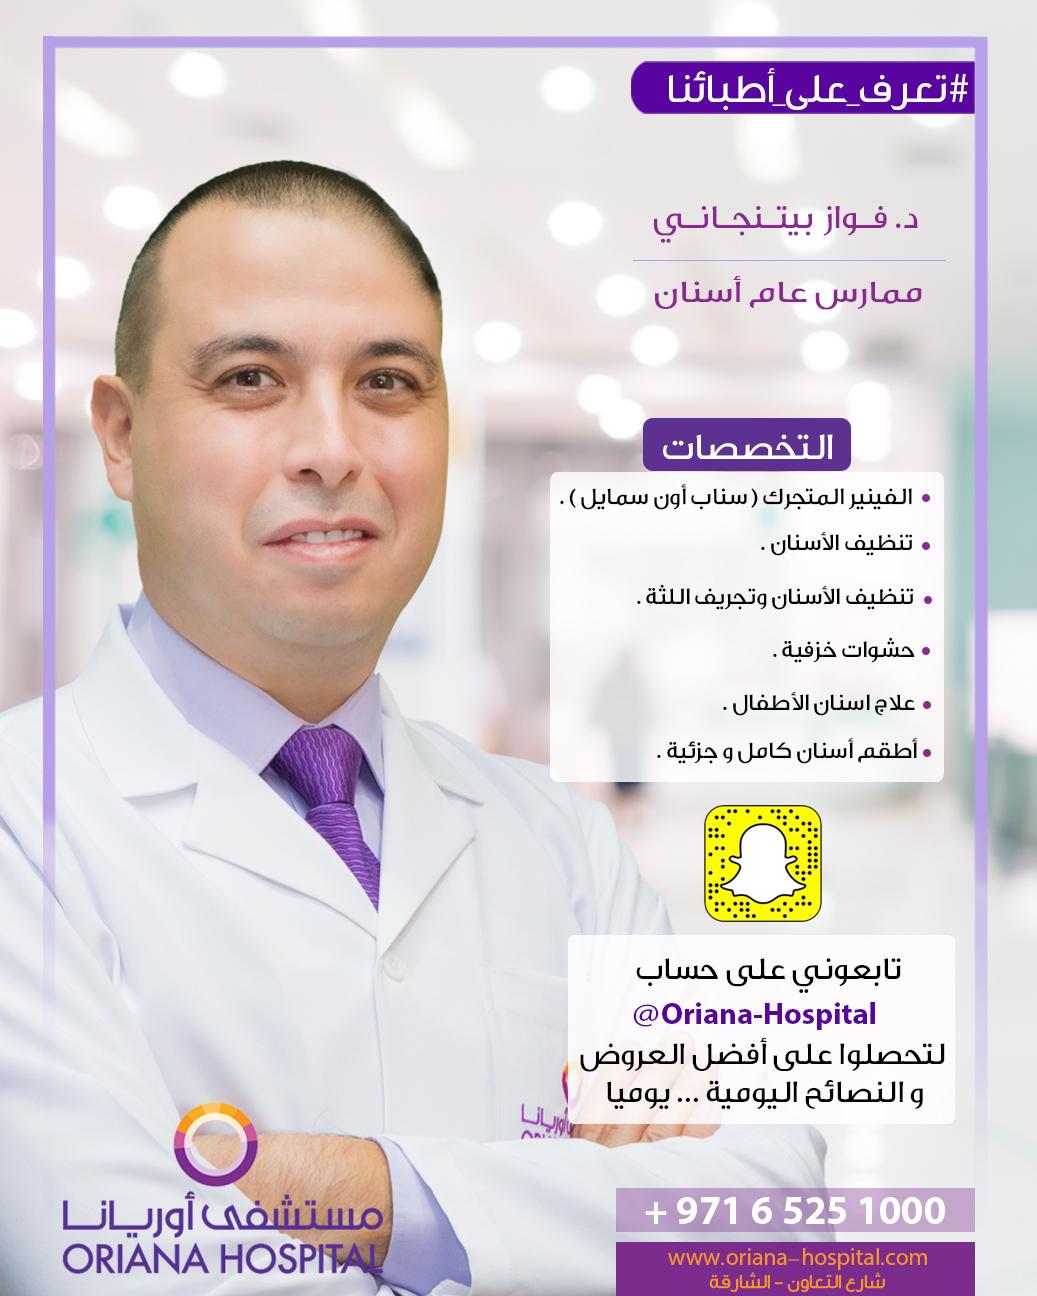 Dr Fawaz Arabic copy